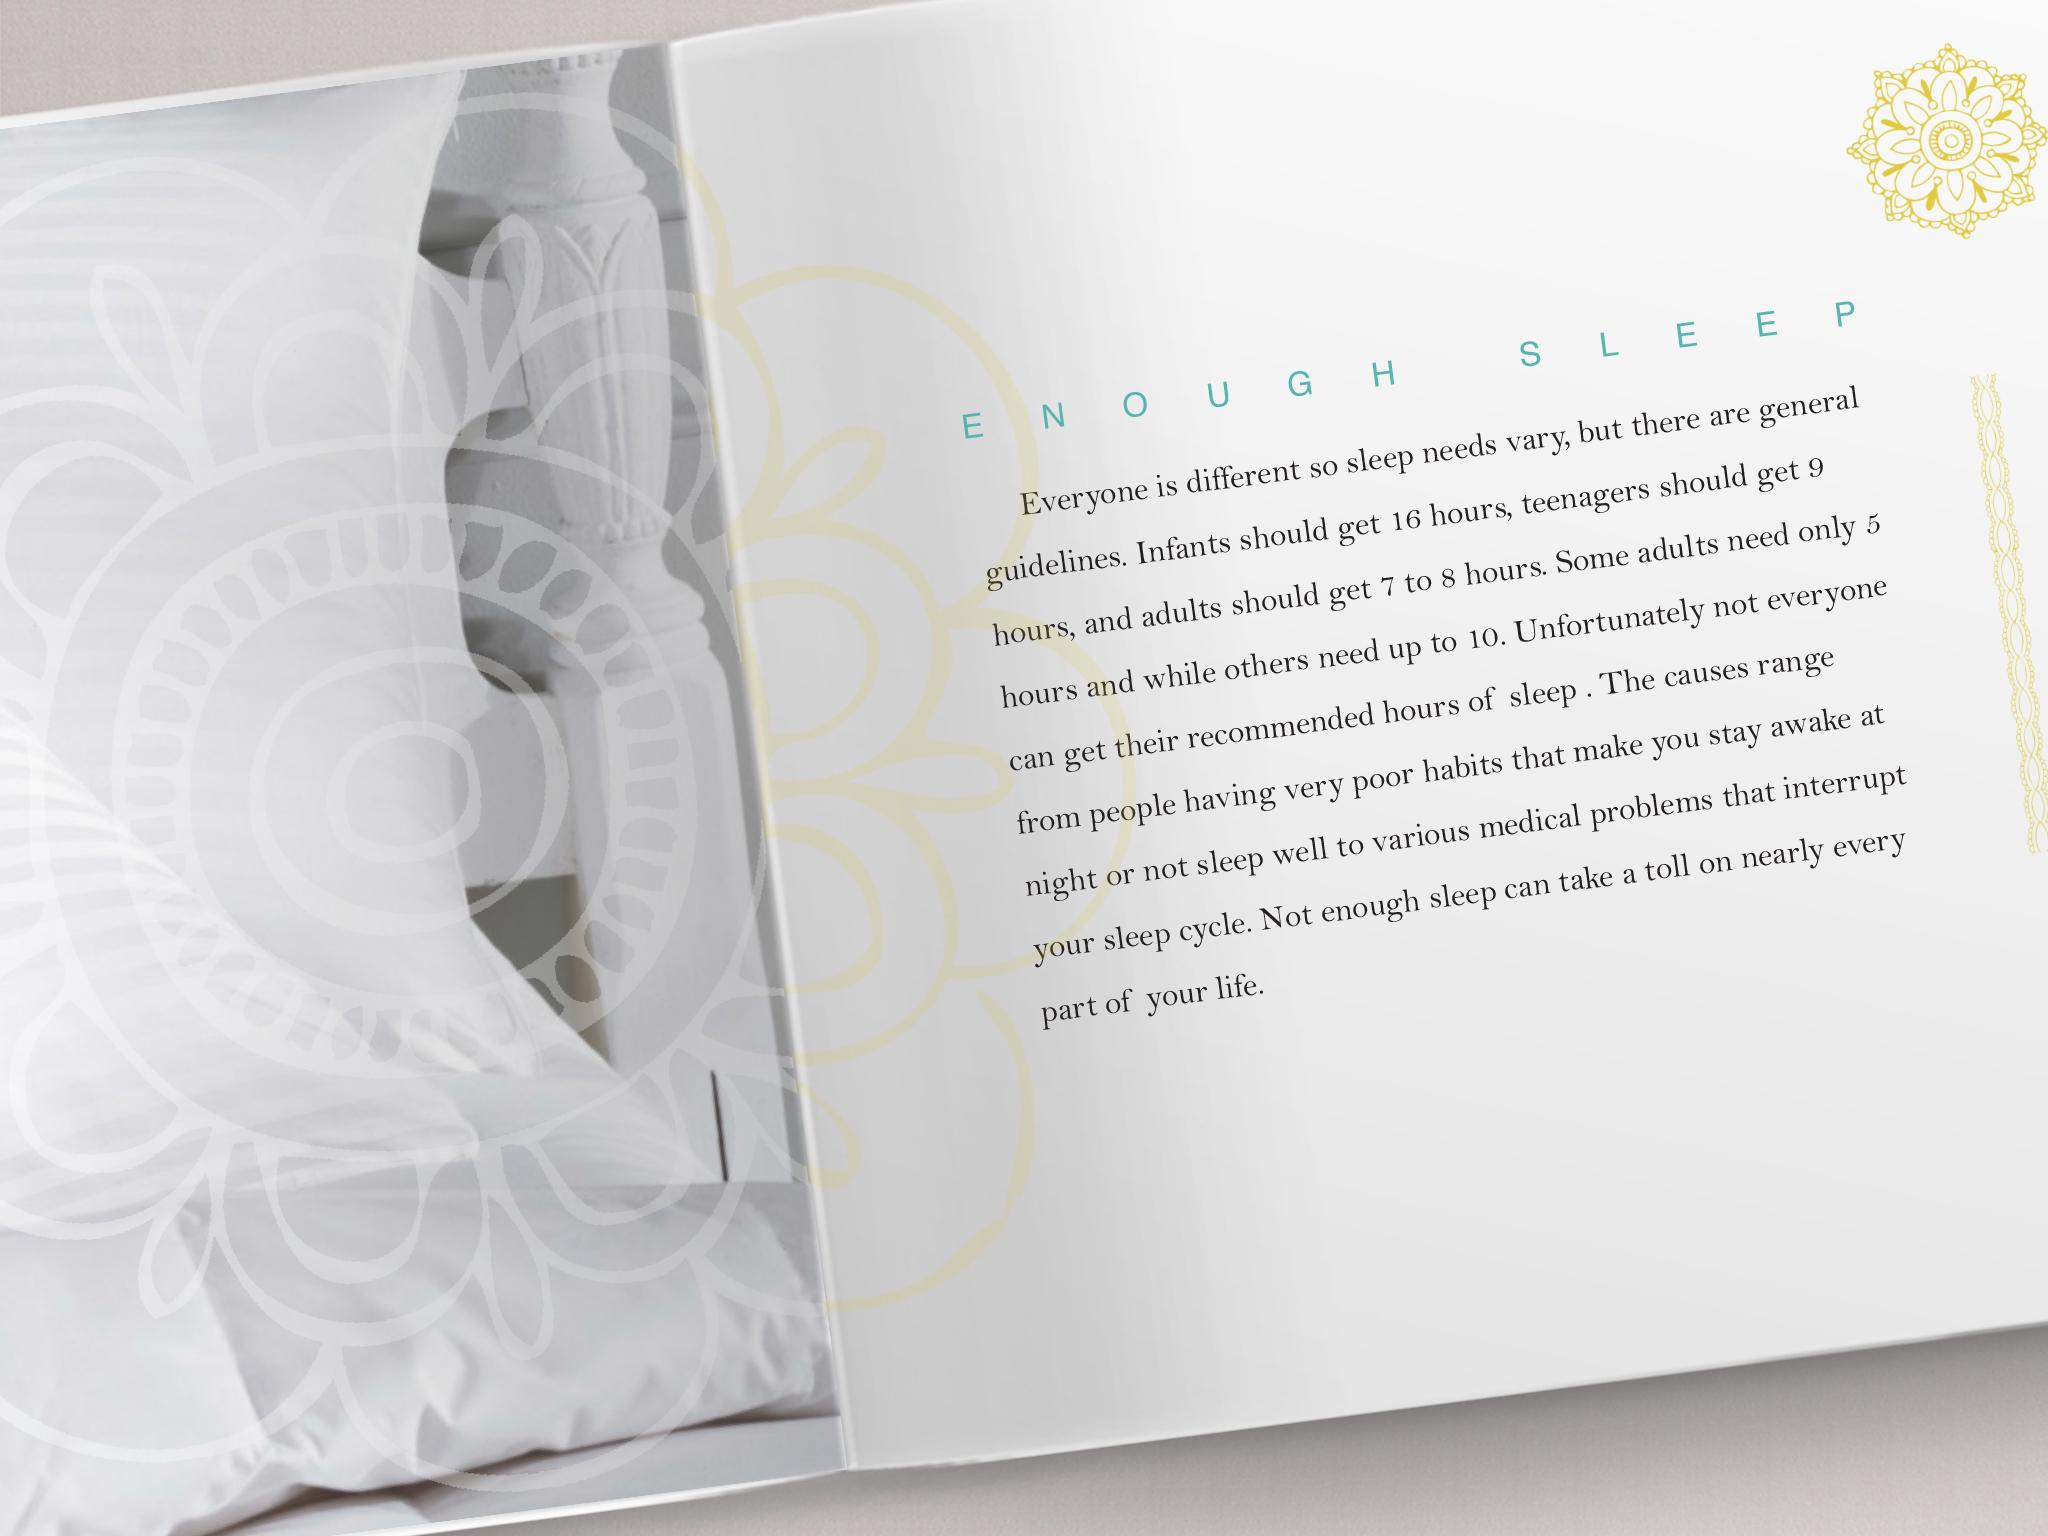 shanti book page 6.jpg